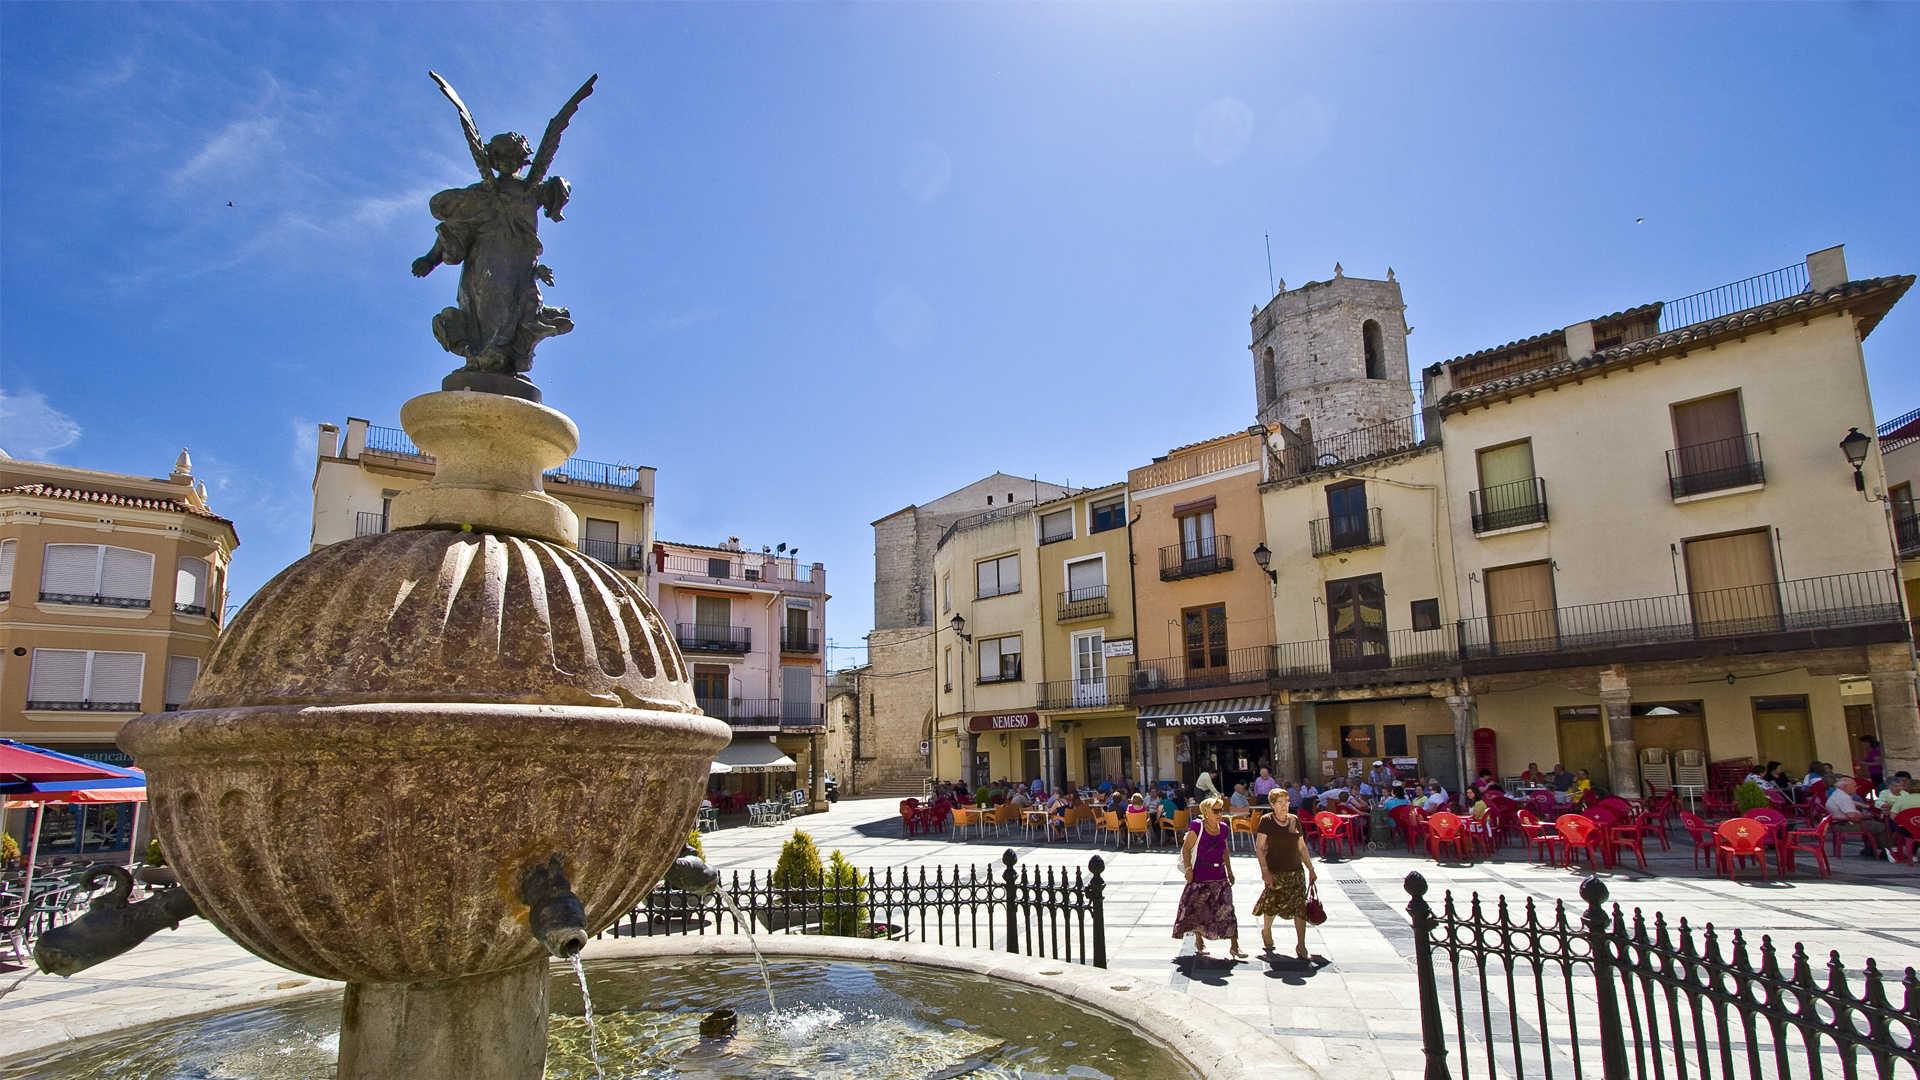 https://multimedia.comunitatvalenciana.com/85DAC8BFB9B34BD0BB5005D0ADB3DC61/img/B30667A6C6BB4701B0AB65BB6E1FEB71/Sant_Mateu_Plaza_Mayor_1.jpg?responsive